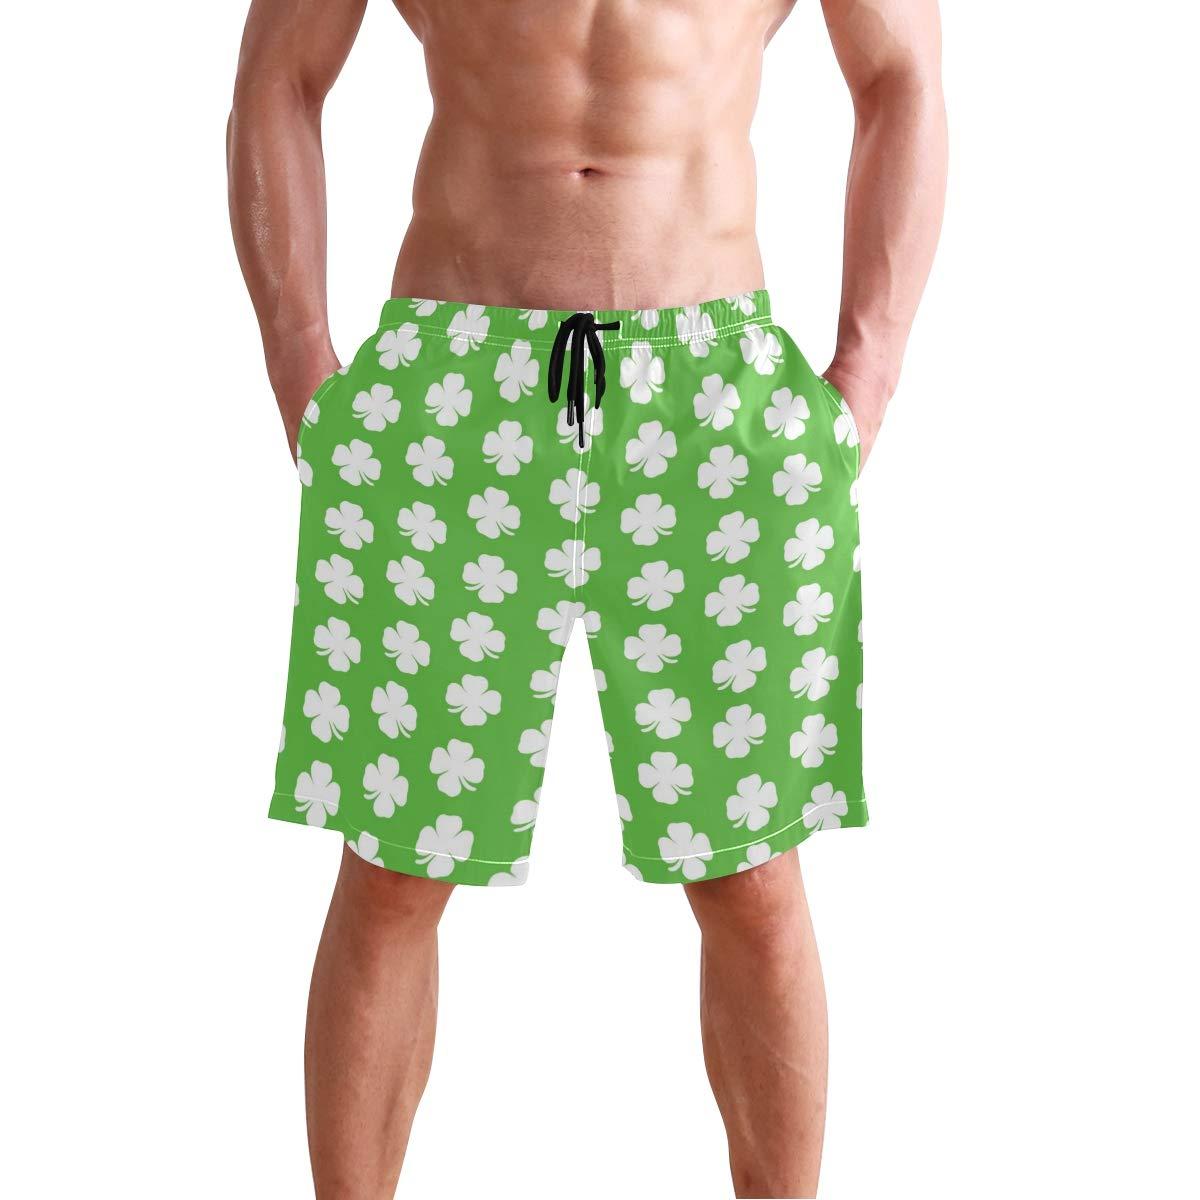 DongDongQiang Men Summer Shamrock Ireland Quick Dry Volleyball Beach Shorts Board Shorts